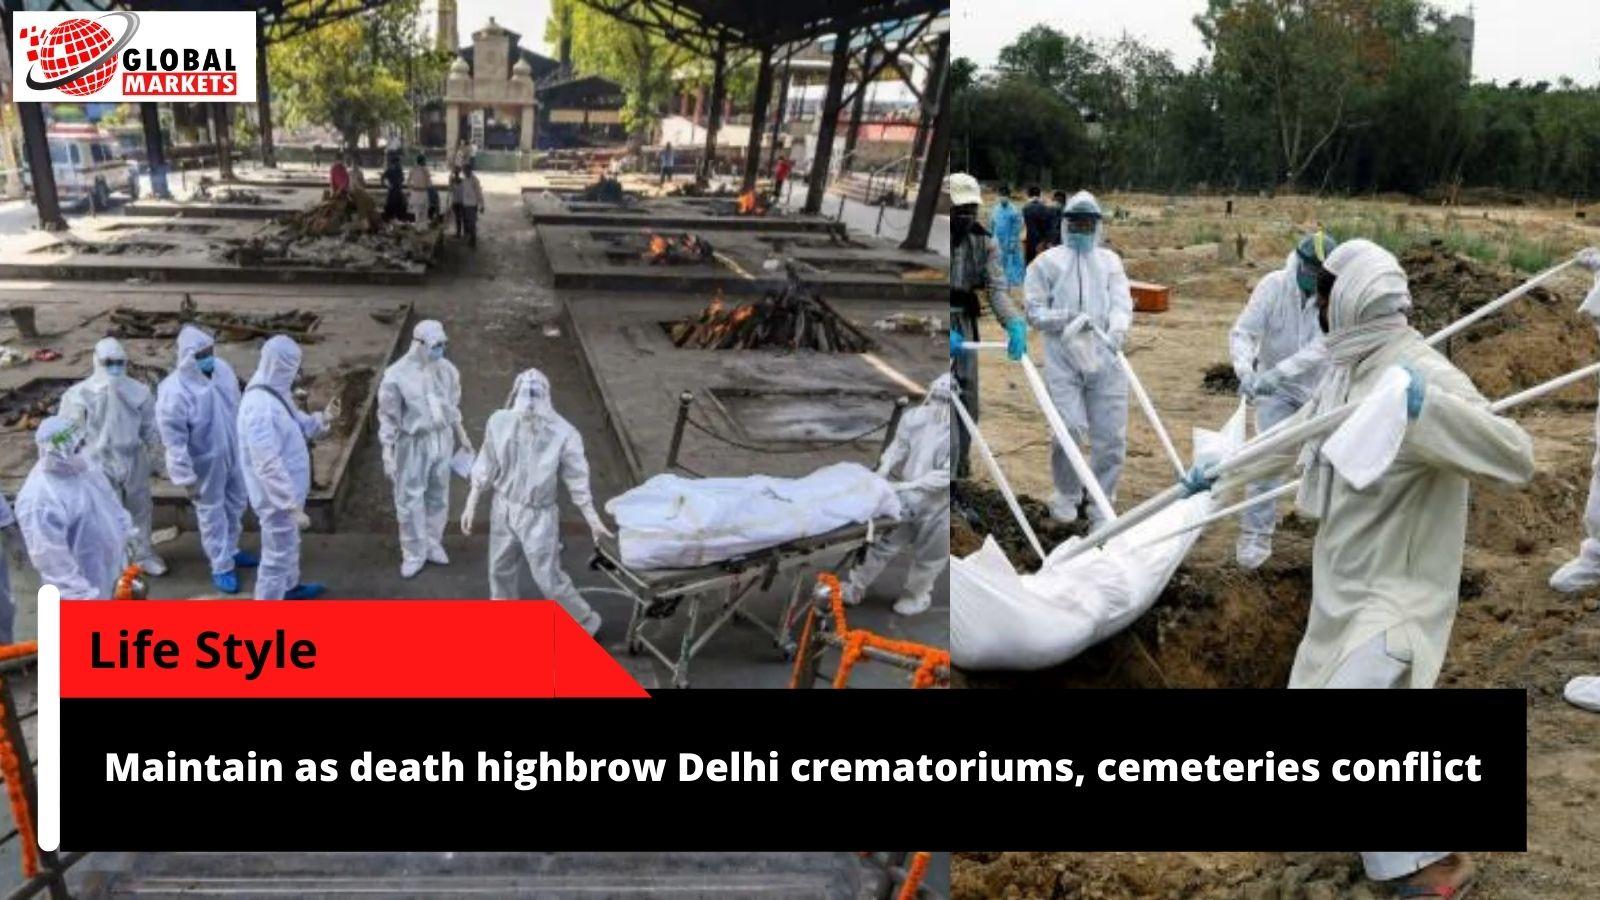 Maintain as death highbrow Delhi crematoriums, cemeteries conflict